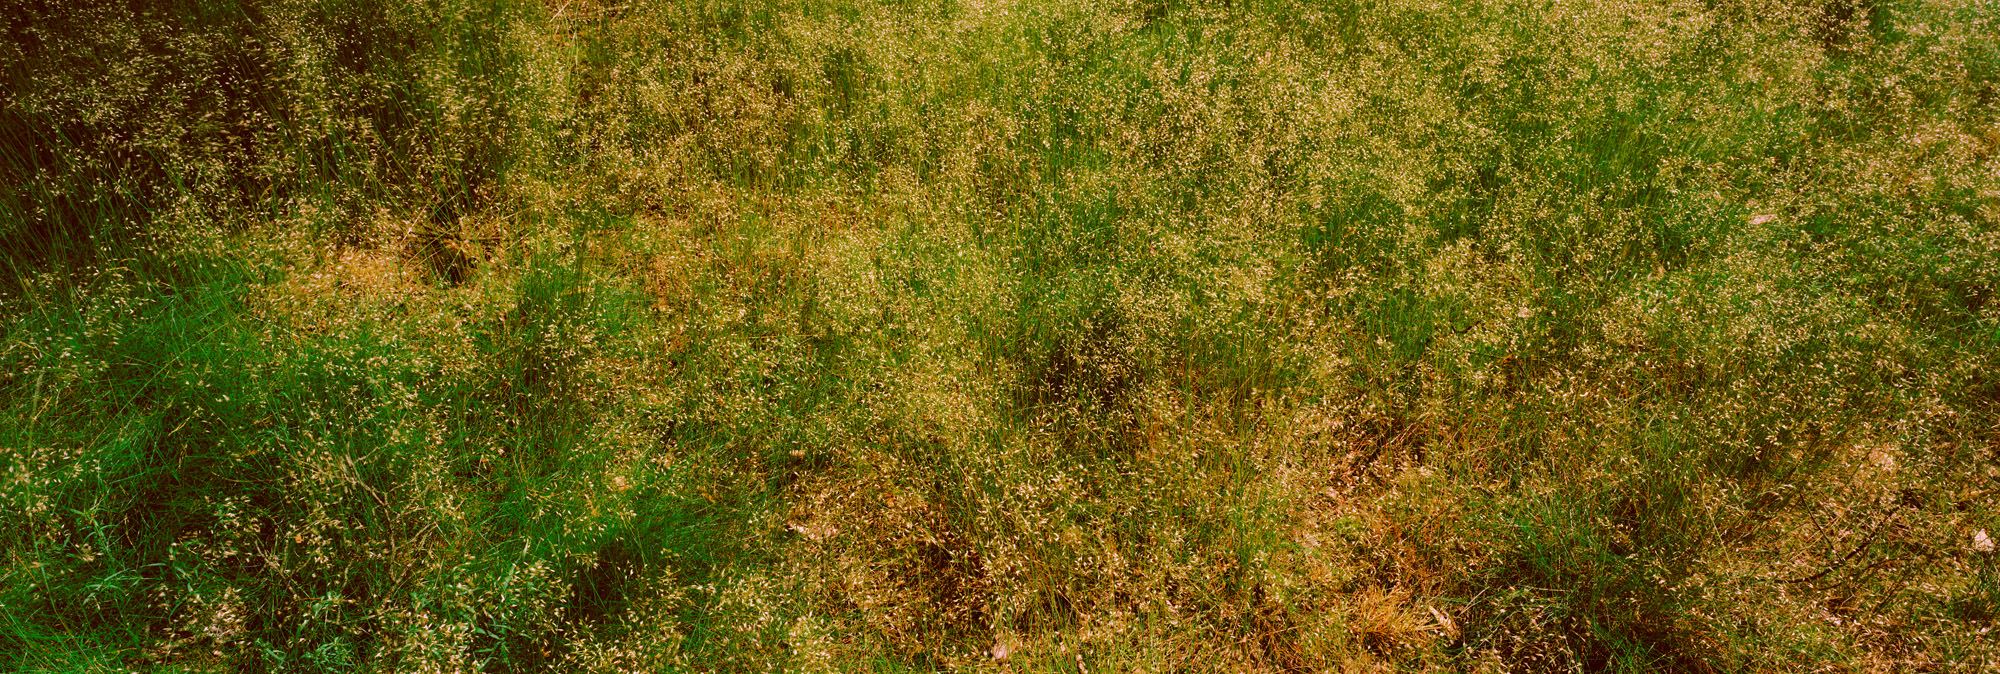 Brachland, Landschaft, Natur, analoge Fotografie, Großformat, Panoramafotografie, Markus Bollen, 6x17, grün, Leben, Wachstum, Frieden, Ruhe, Gras, Wiese